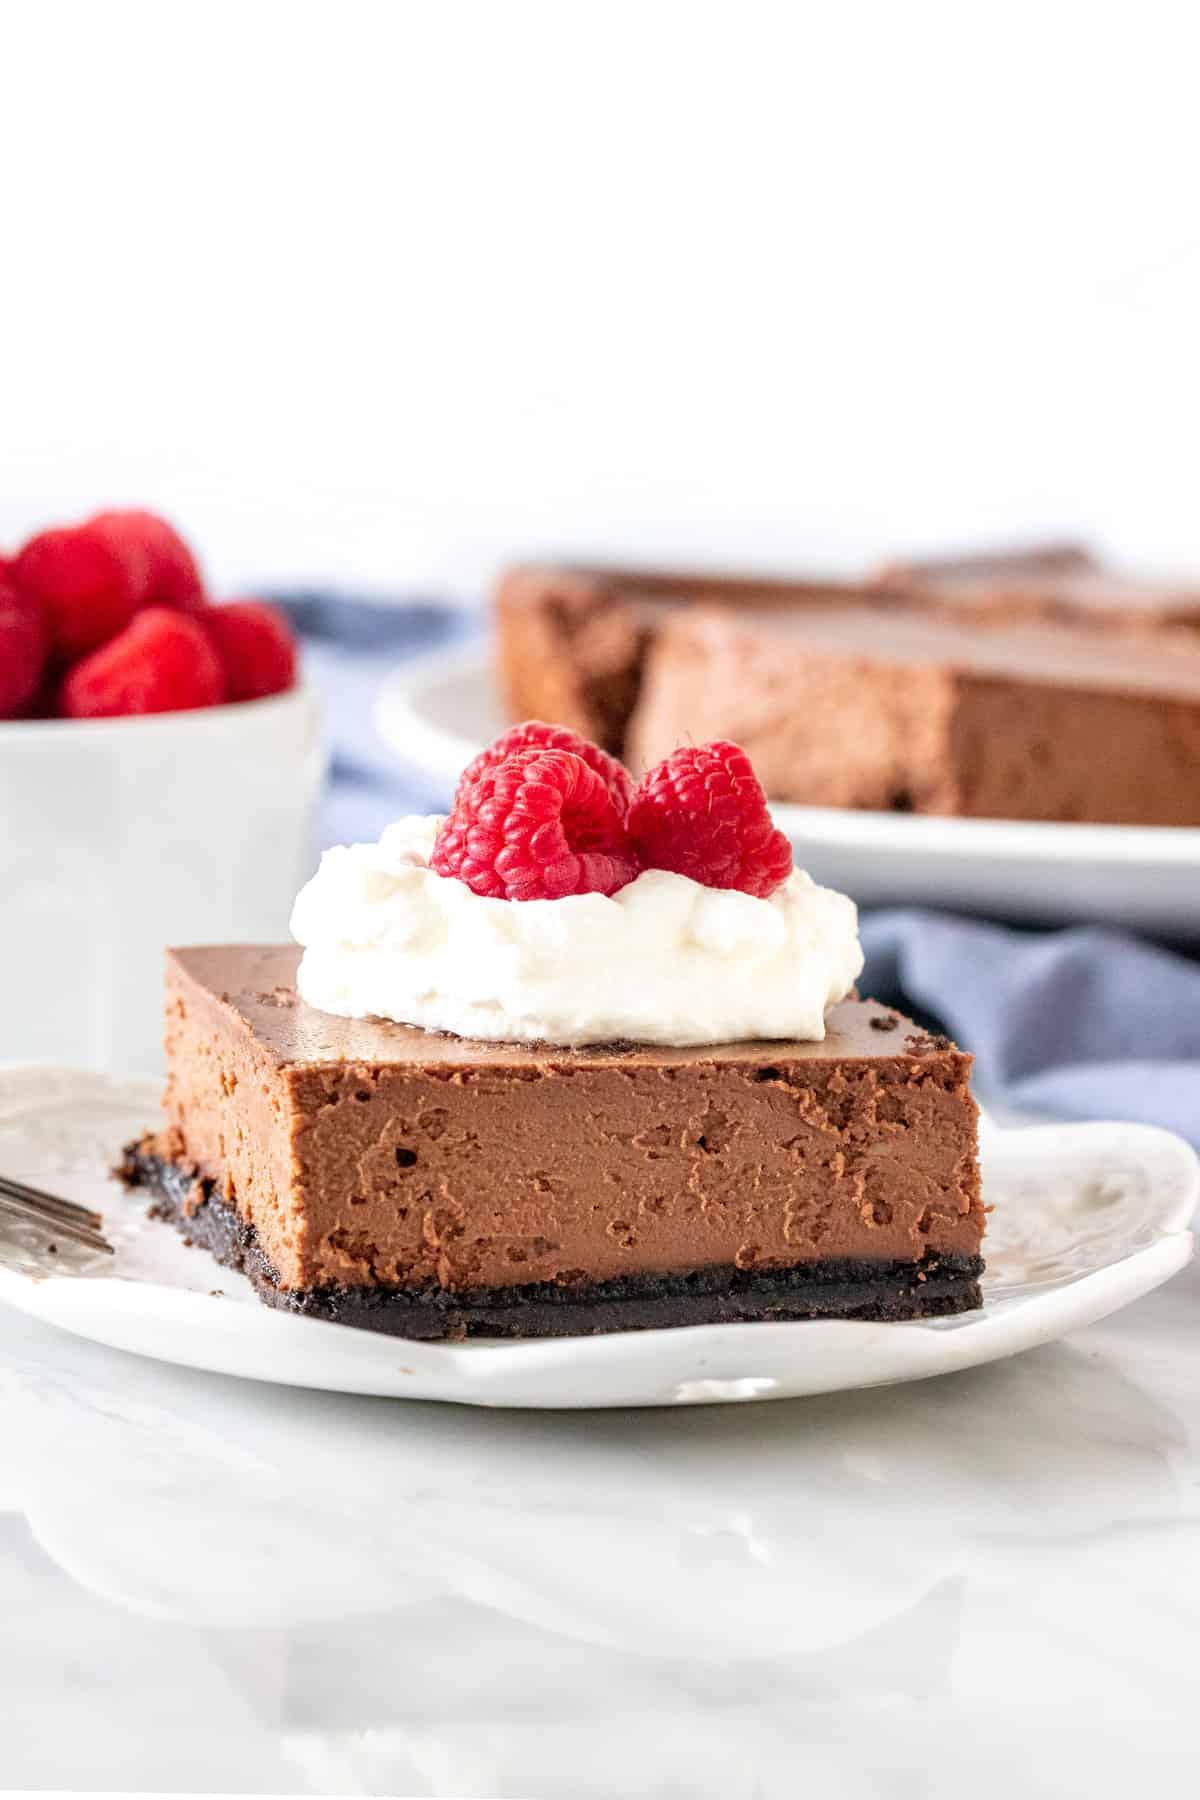 Slice of chocolate cheesecake bars on a plate.